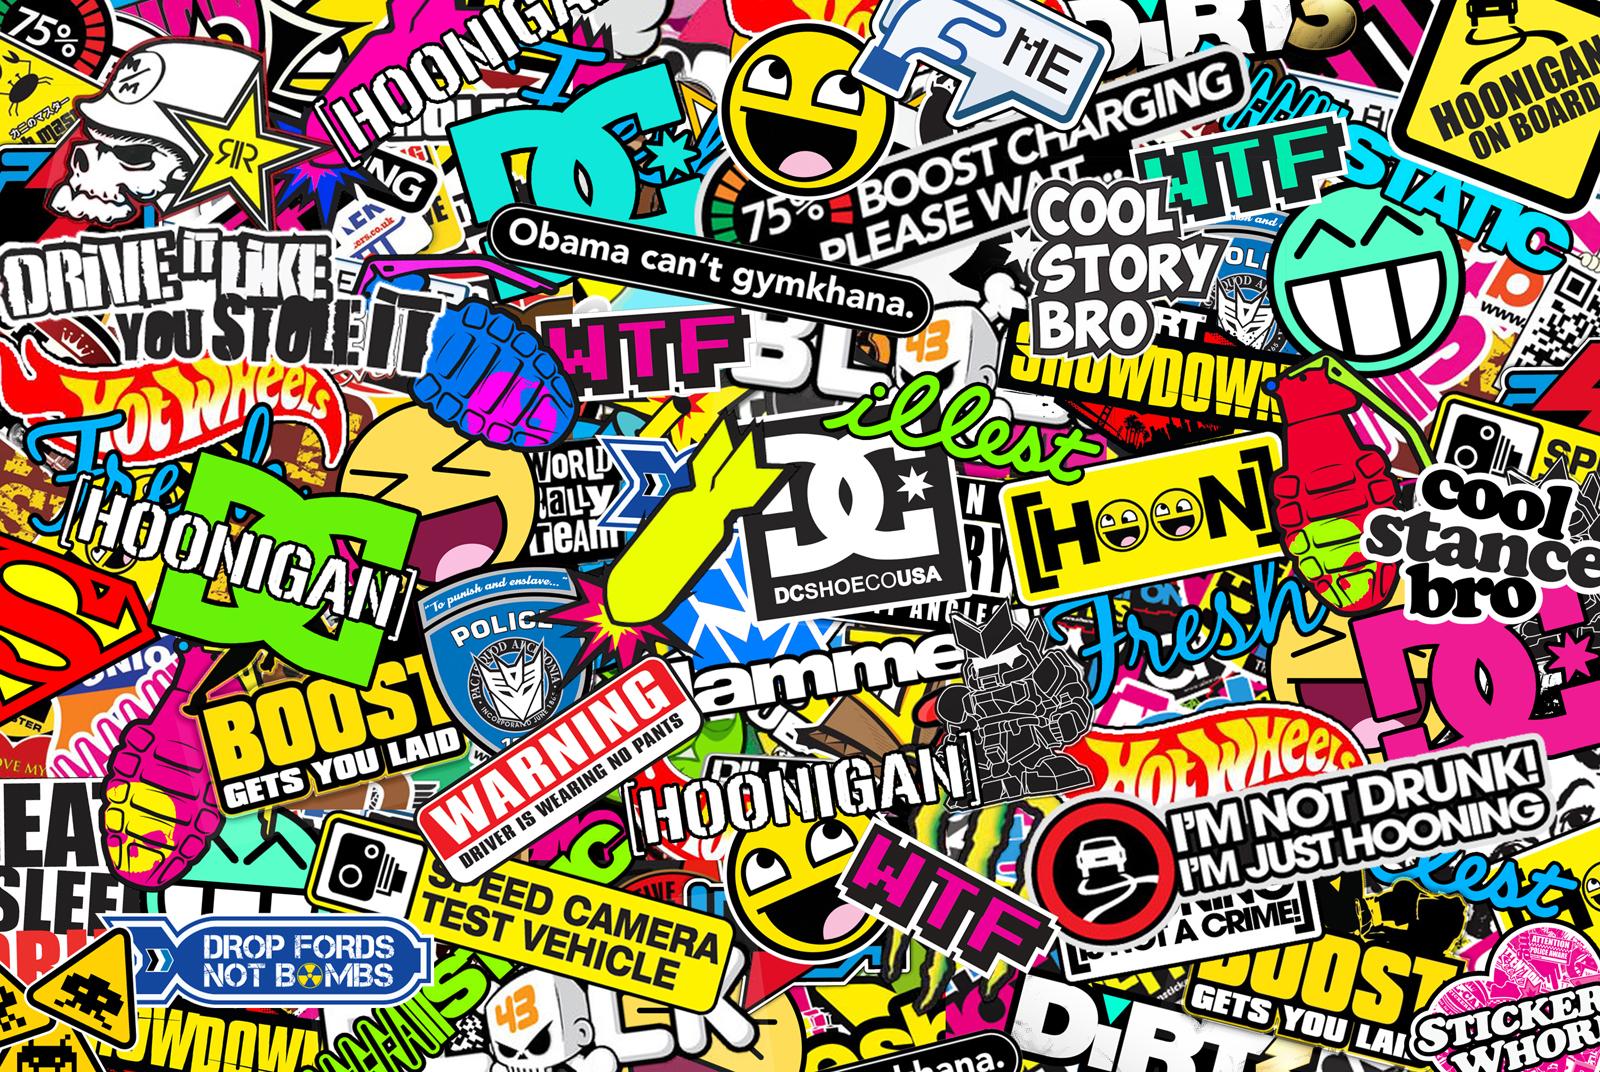 Sticker bomb car design - 9 Comments